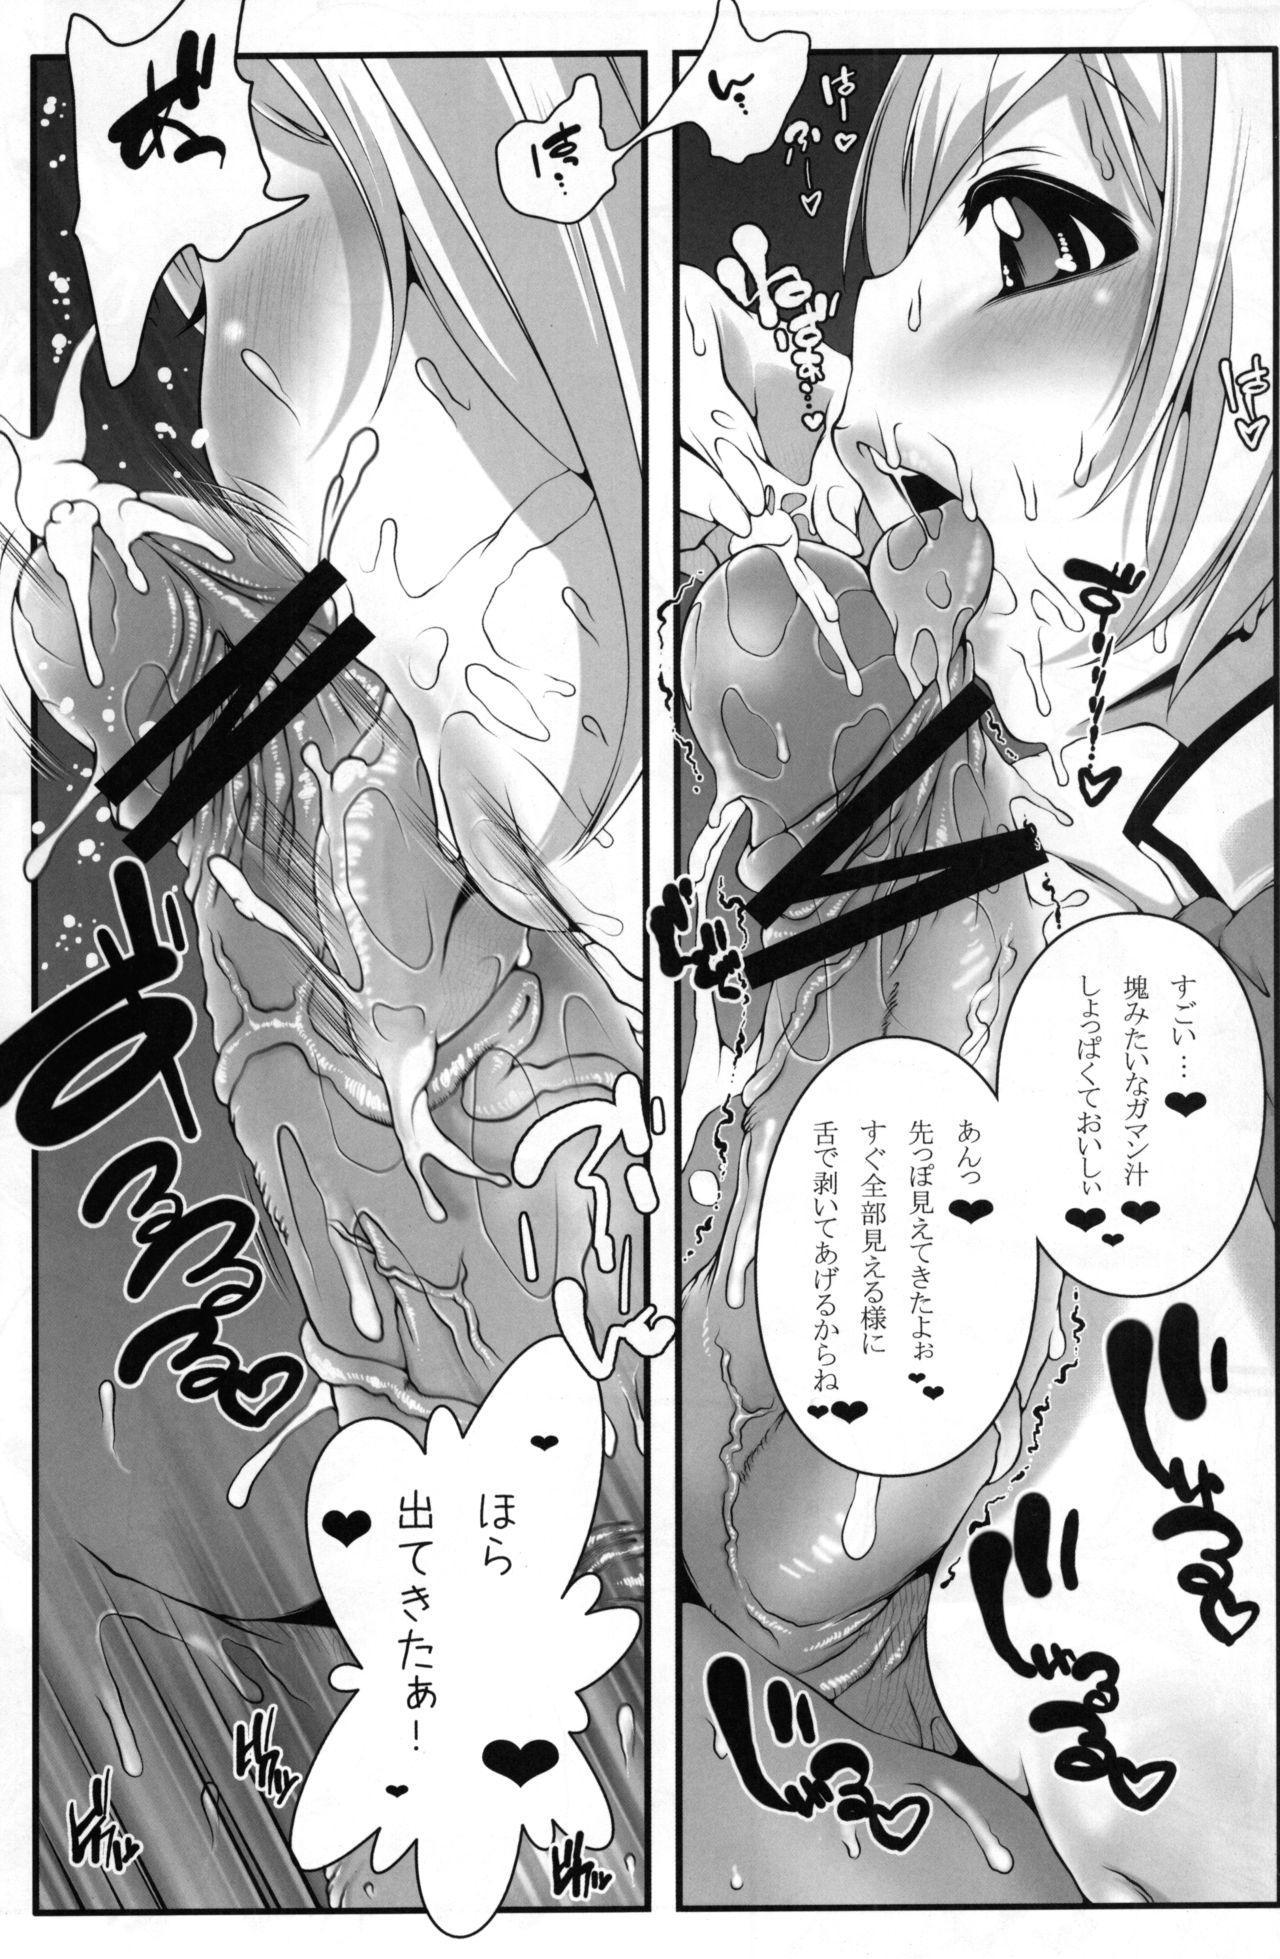 Mami-san to. 5